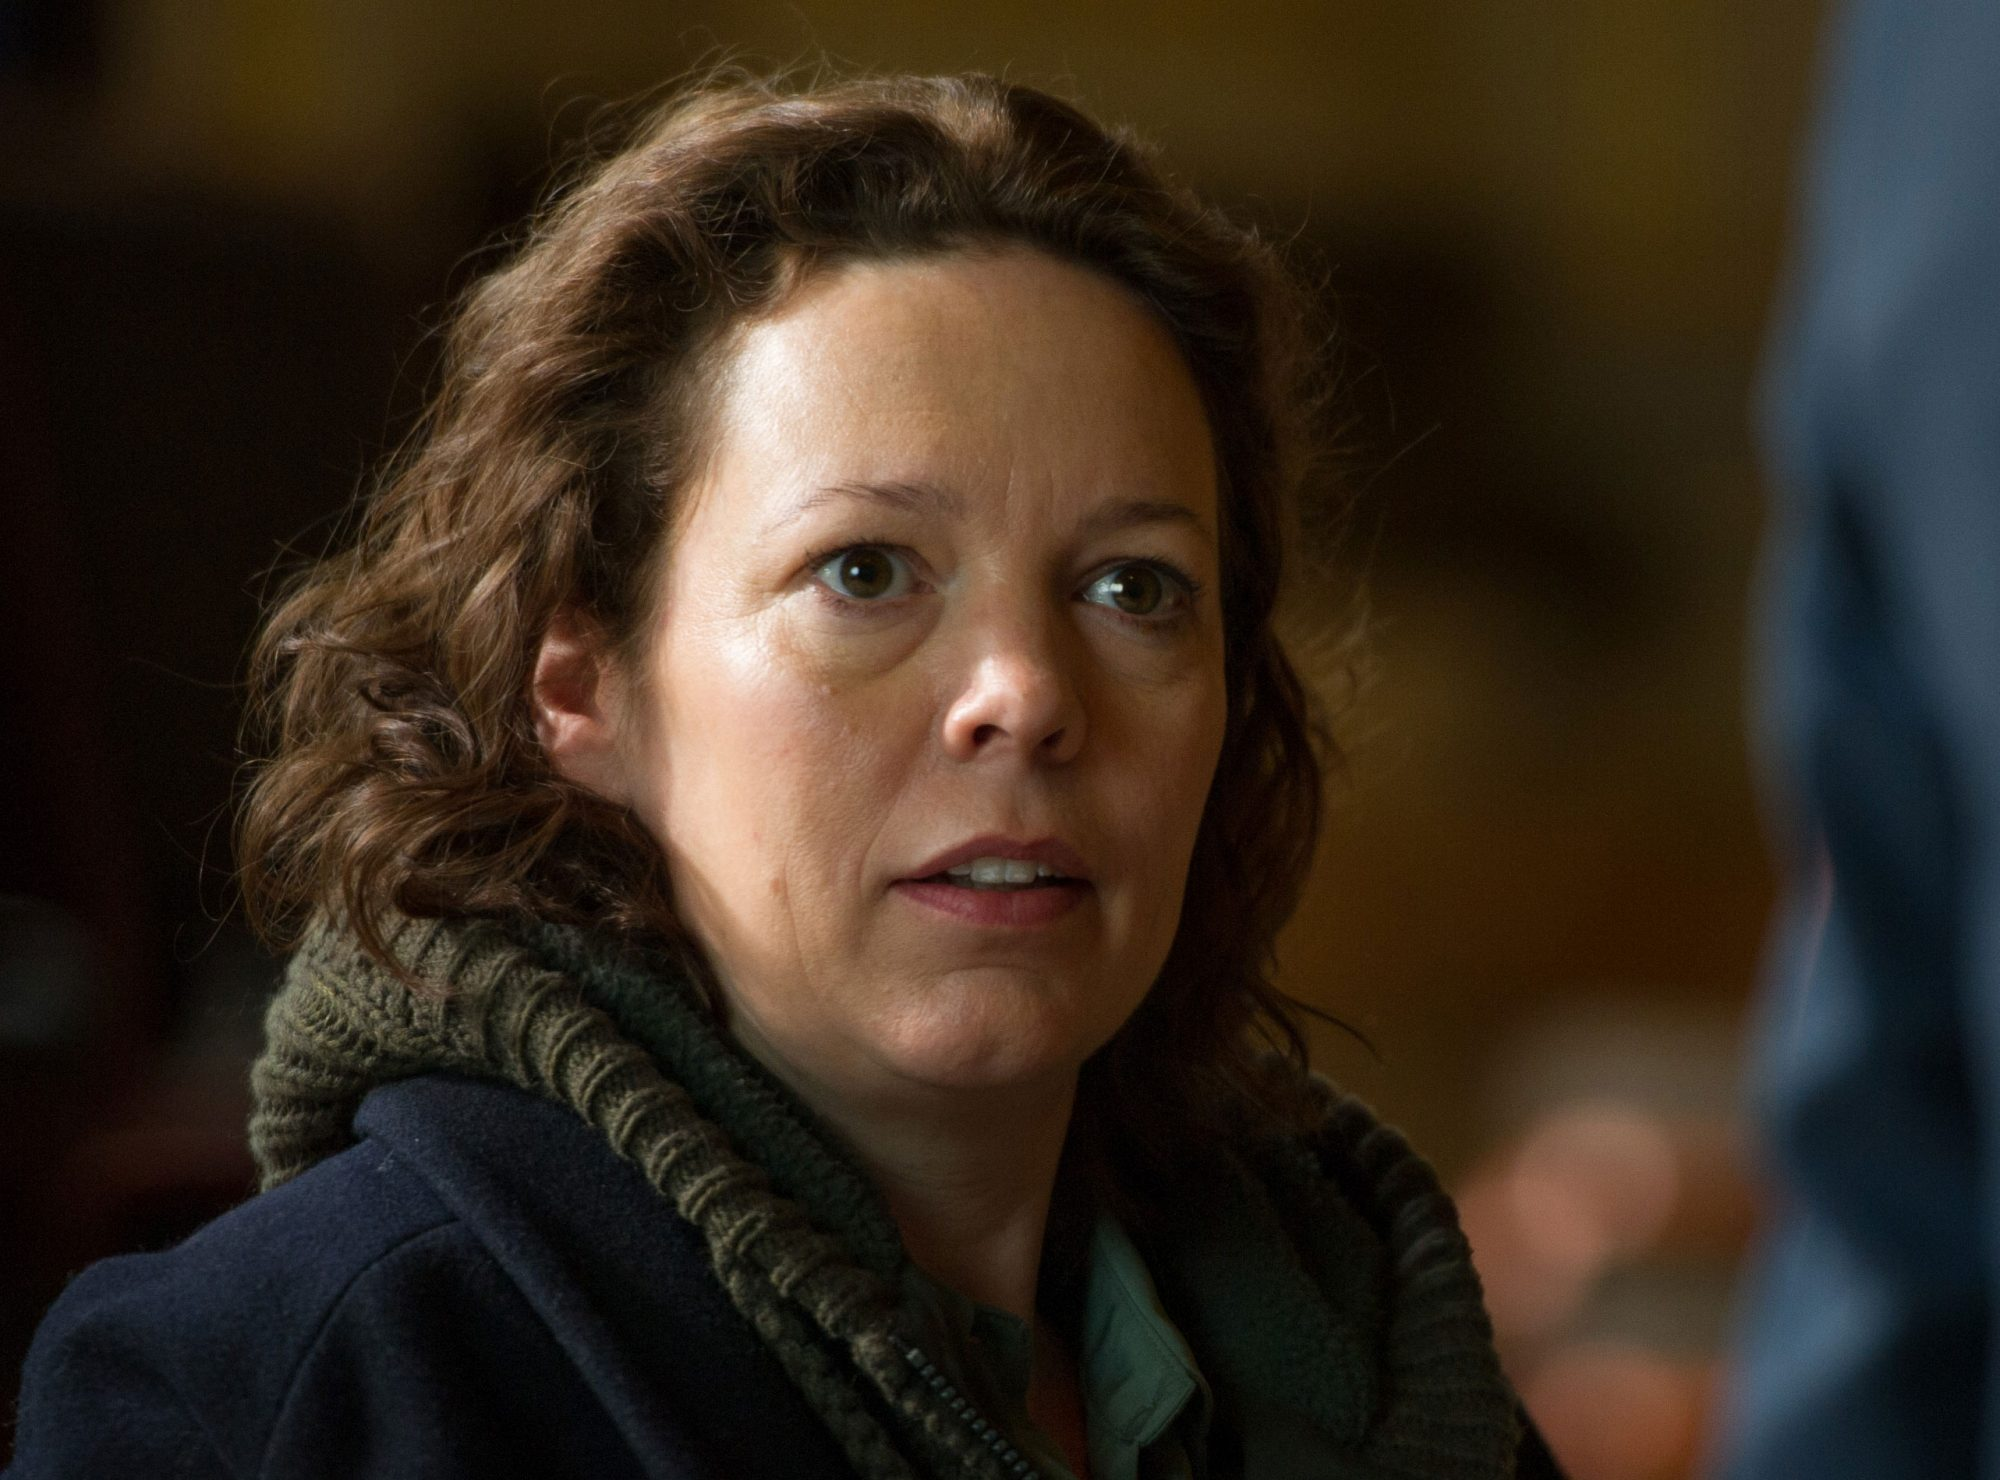 THE NIGHT MANAGER (2016)Season 1, Episode 1 Olivia Colman as Angela Burr